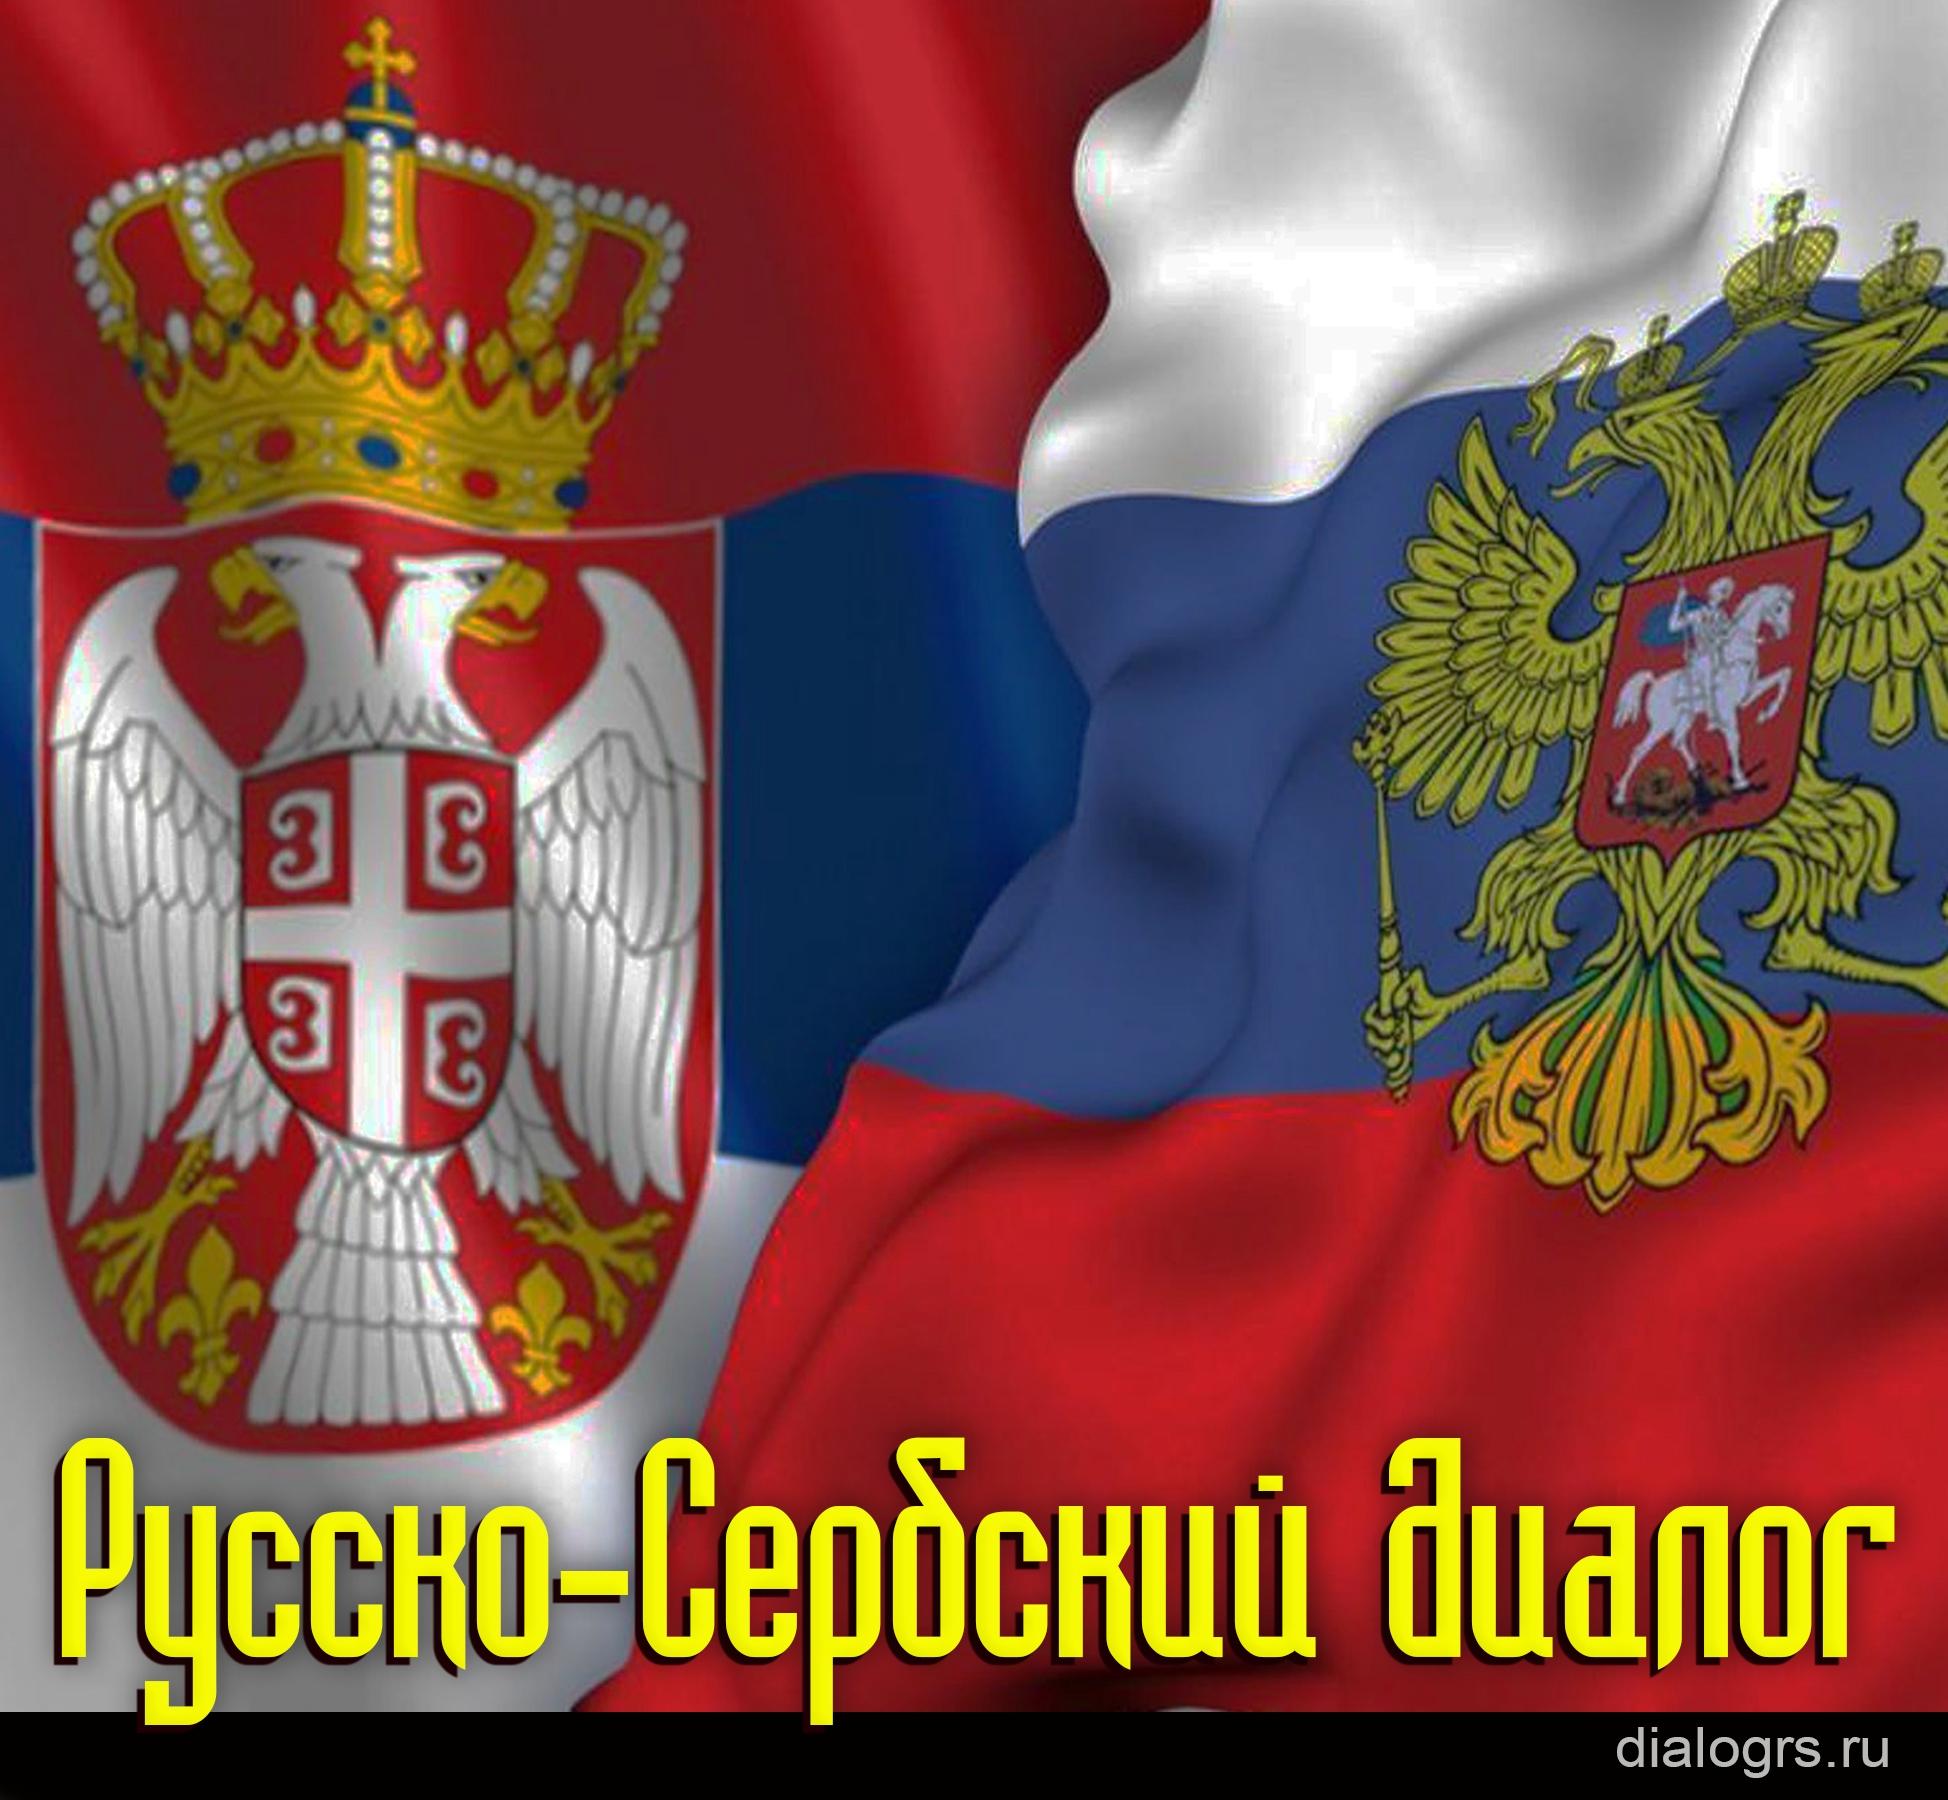 Русско-Сербский диалог